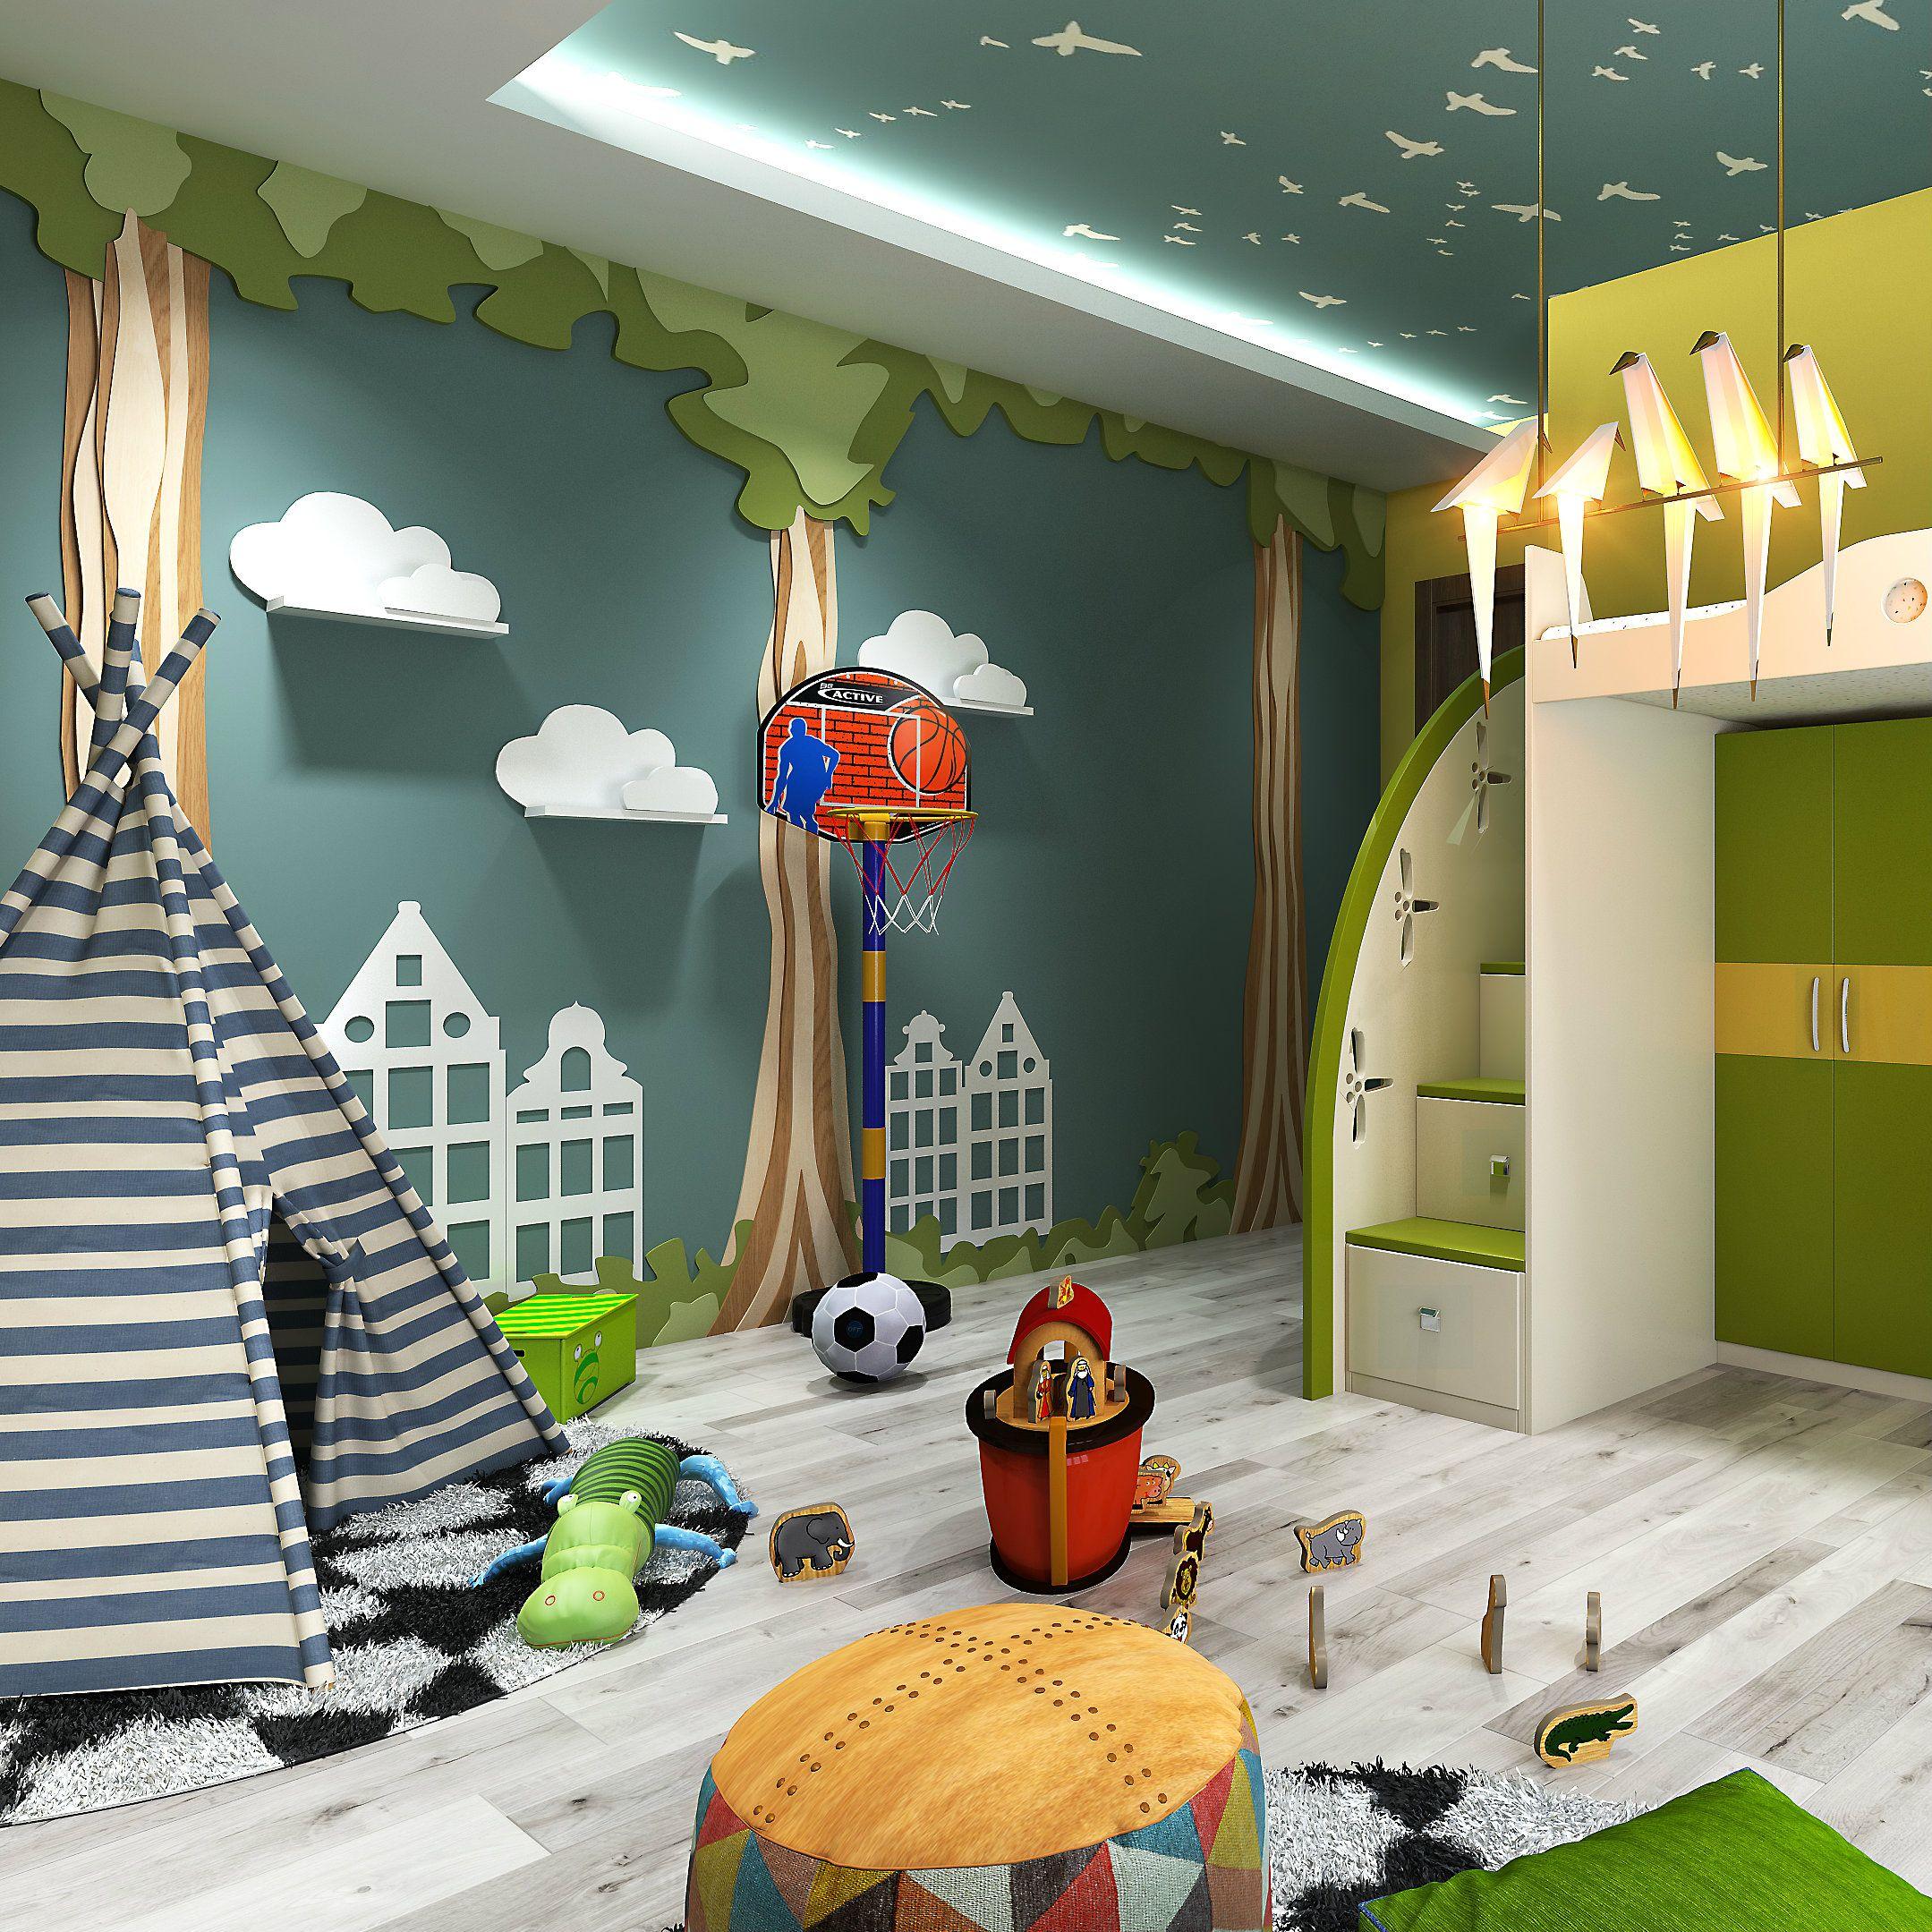 A Camping Inspired Kids Room That Kids Will Love Kids Bedroom Designs Game Room Kids Boys Bedroom Makeover